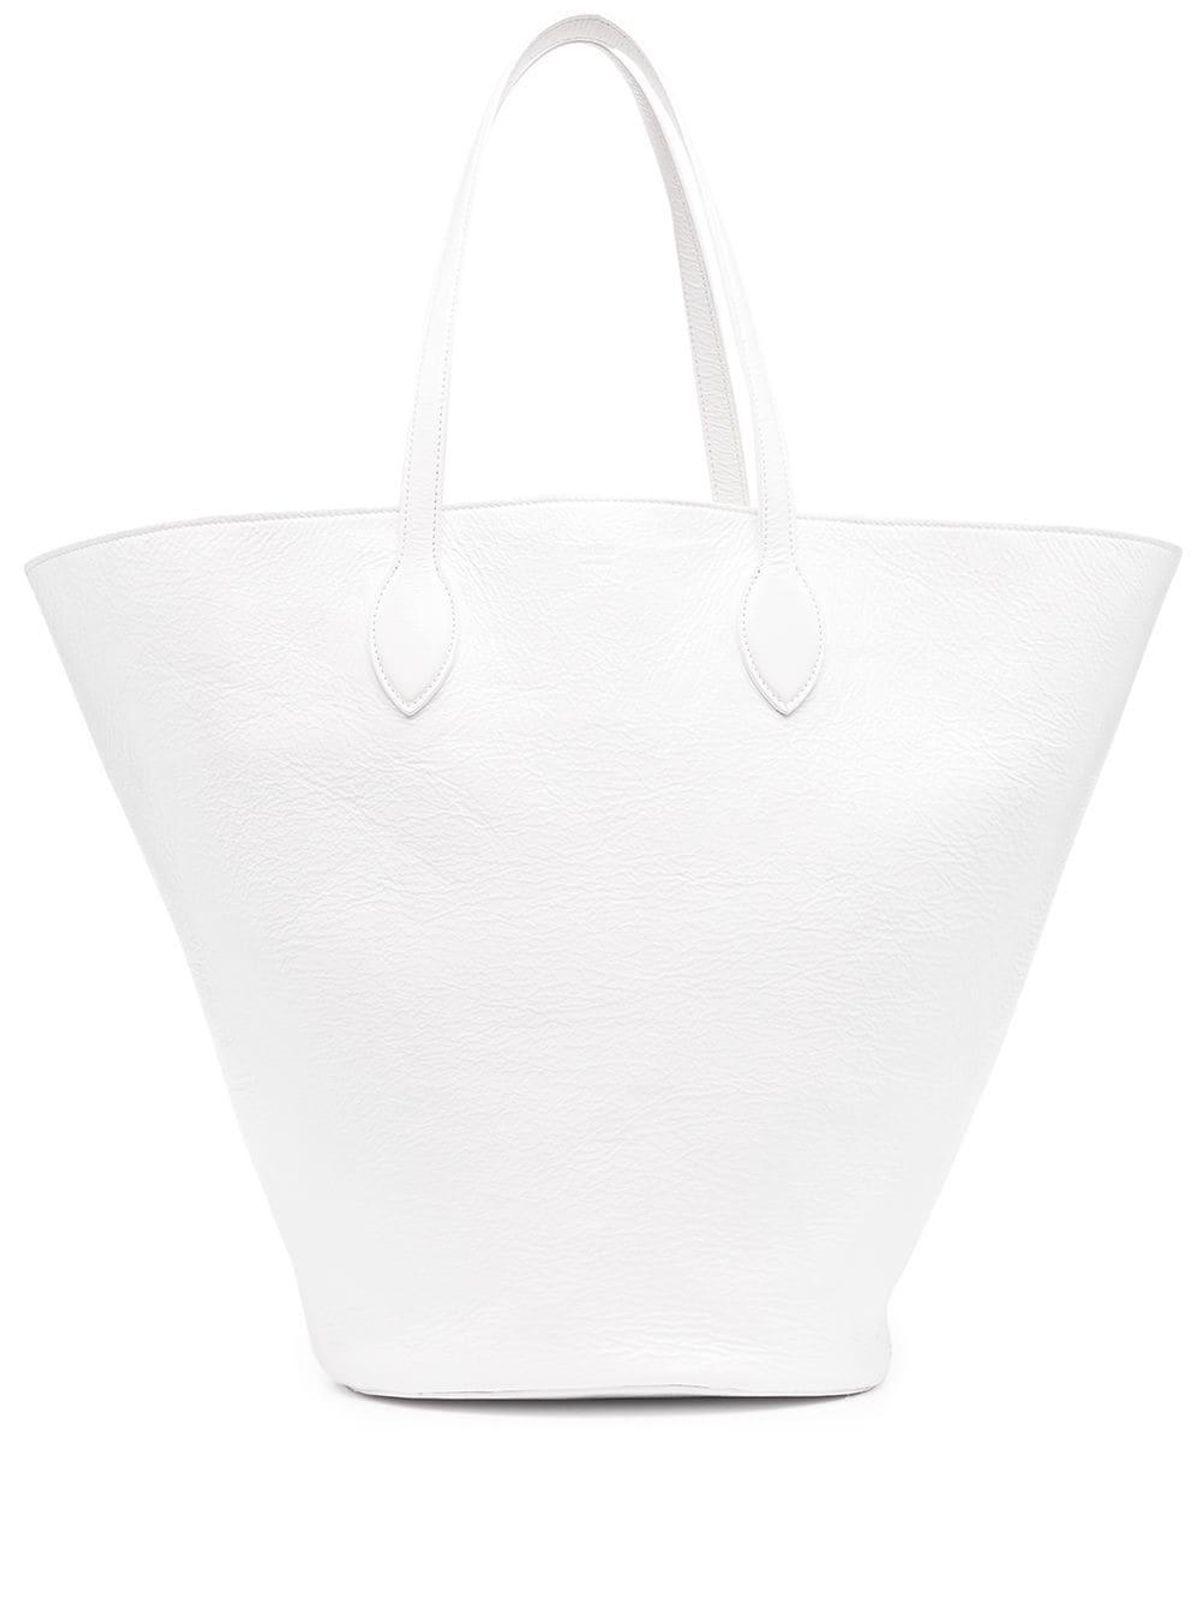 Medium Osa Tote in White Patent Leather